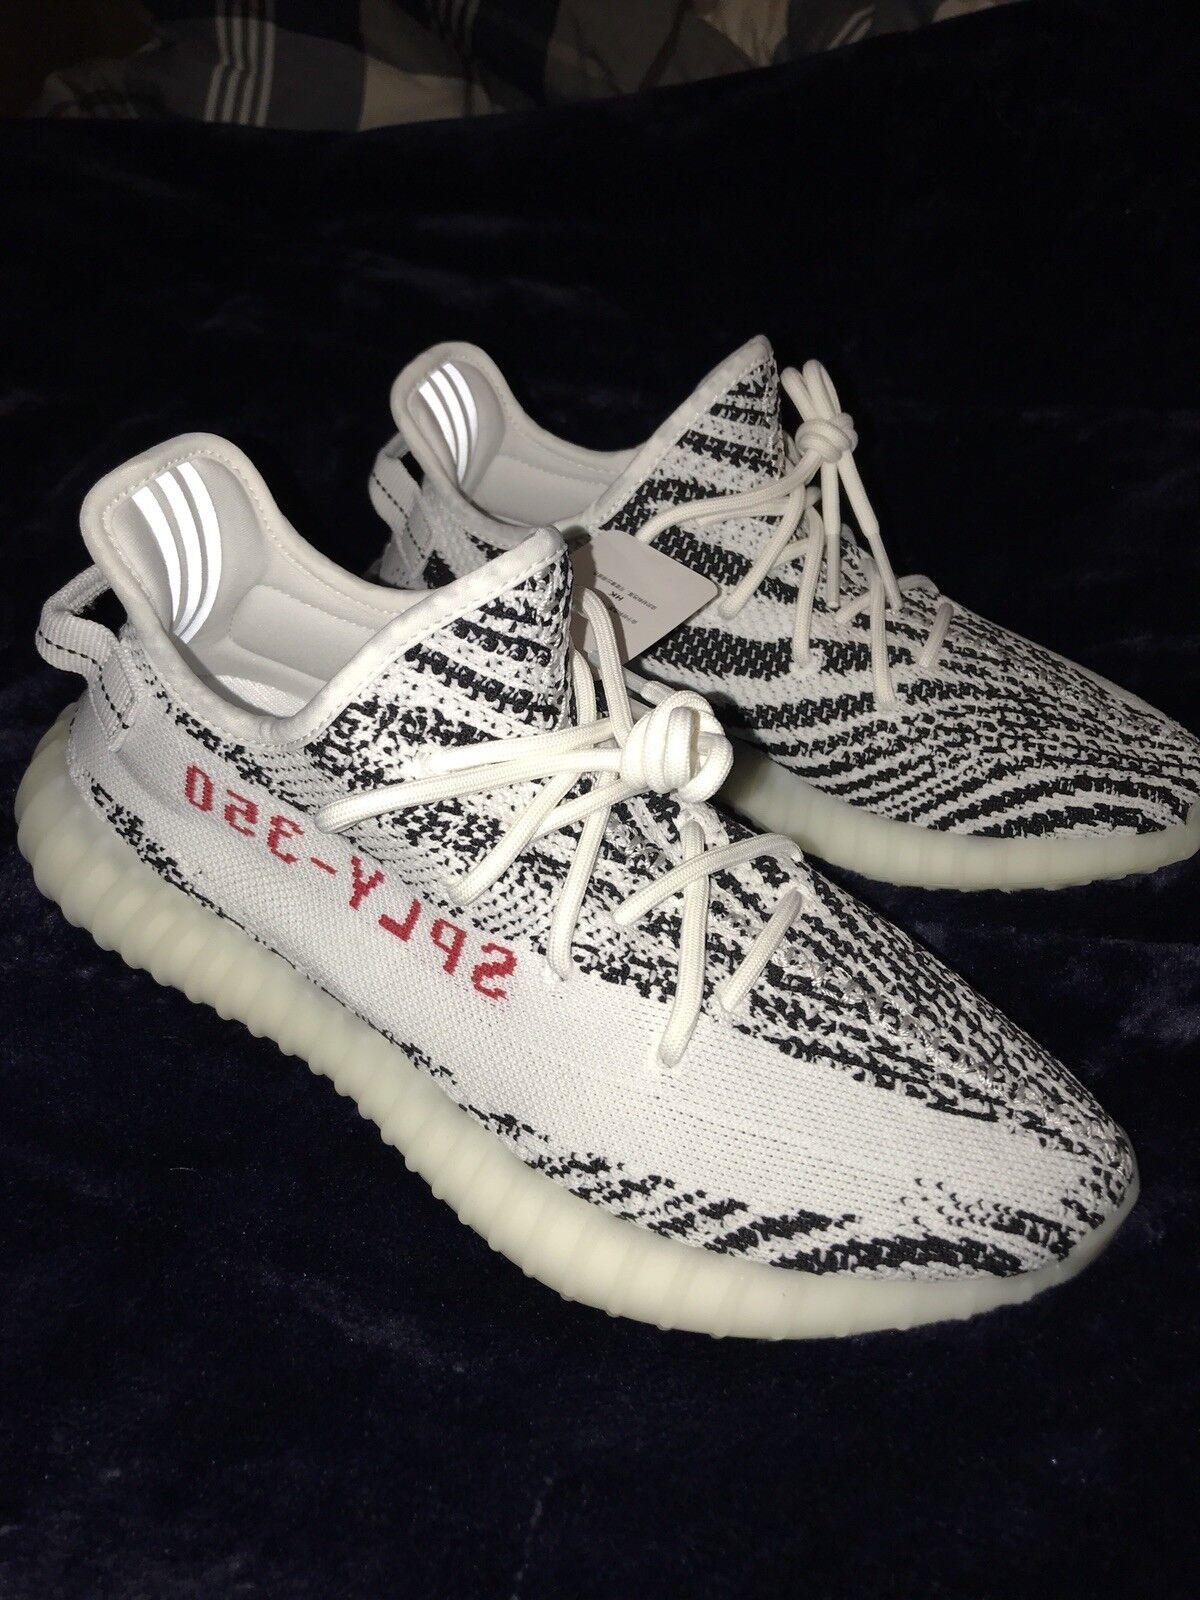 yeezy boost 350 v2 Zebra and Cream